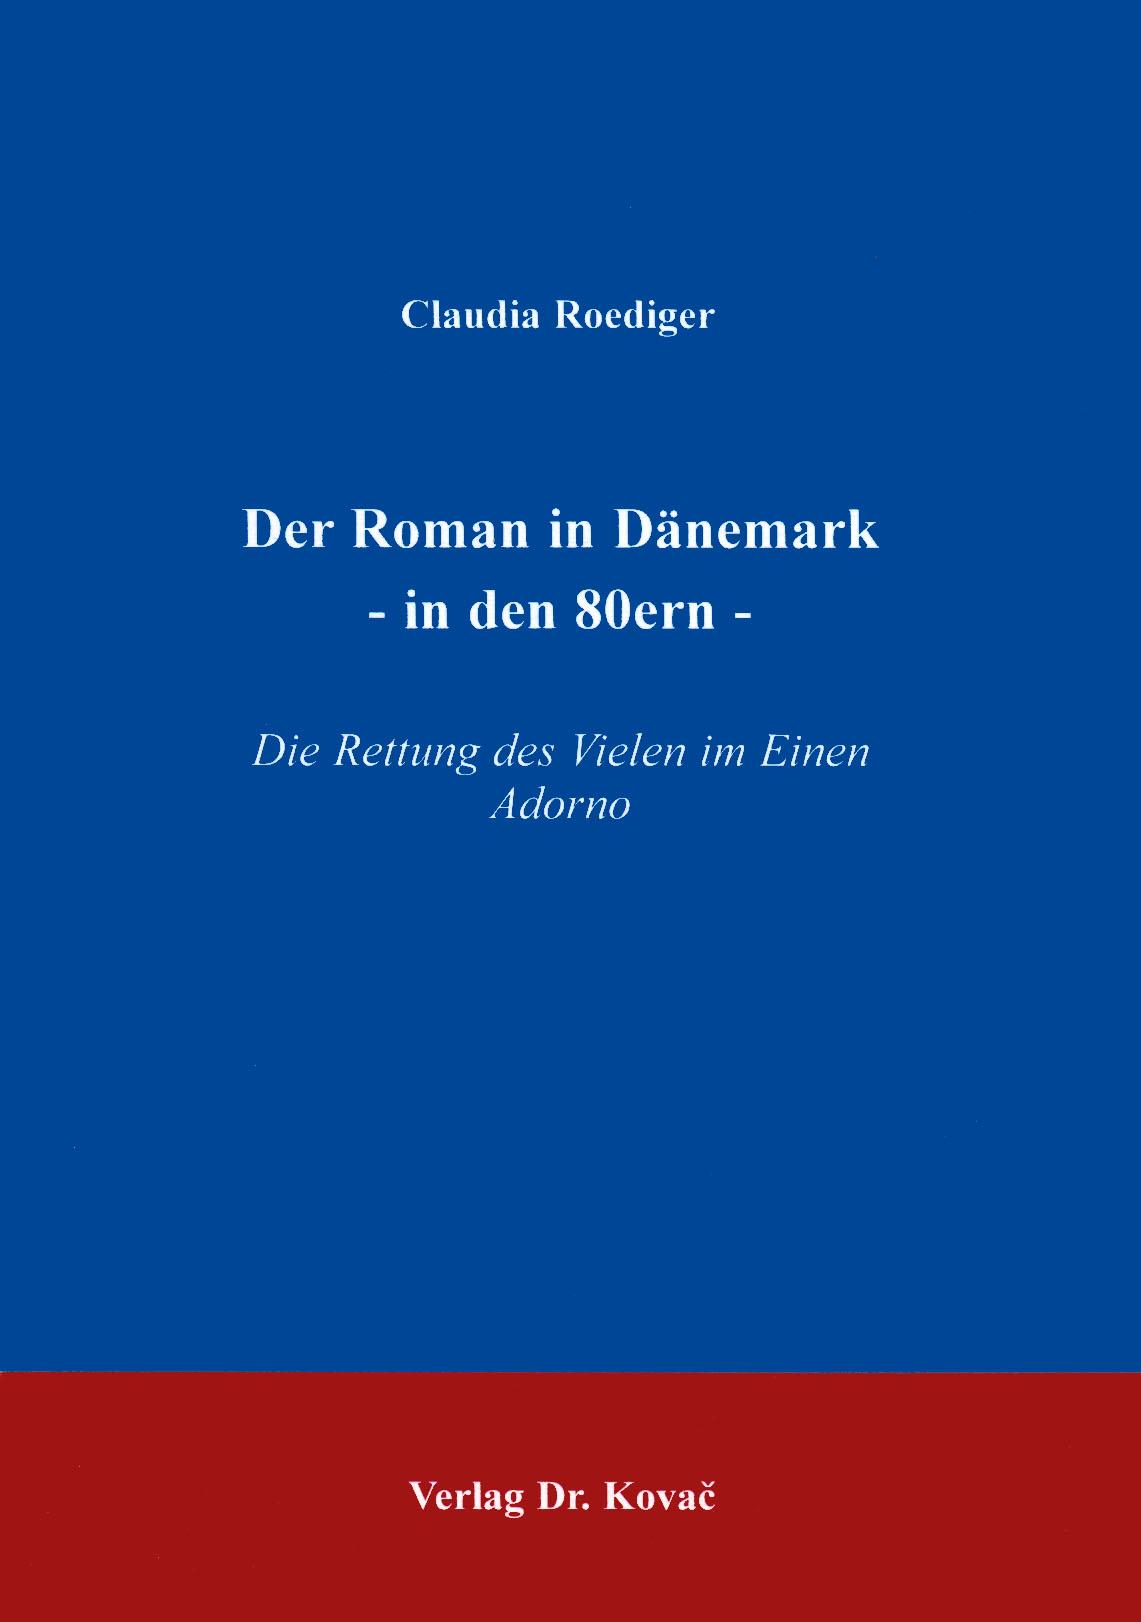 Cover: Der Roman in Dänemark -in den 80ern-